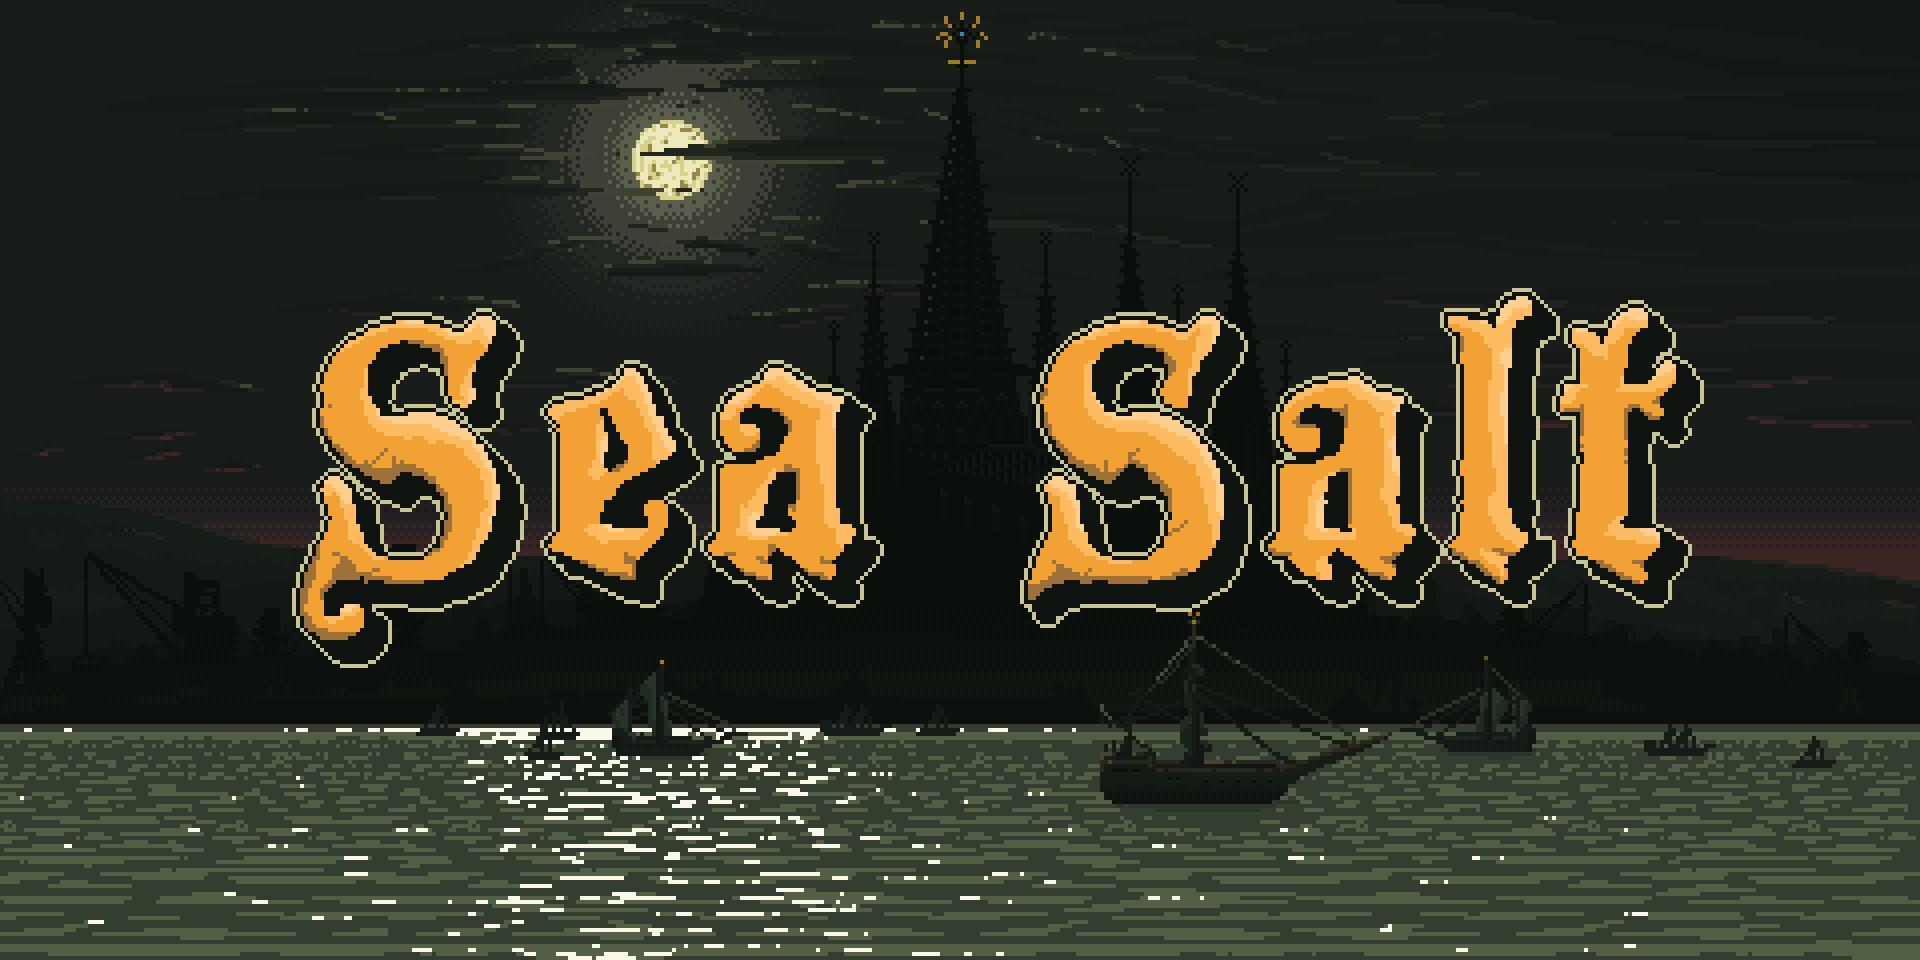 《Sea Salt》:充斥血腥暴力的像素游戏,演绎反英雄式的克苏鲁神话